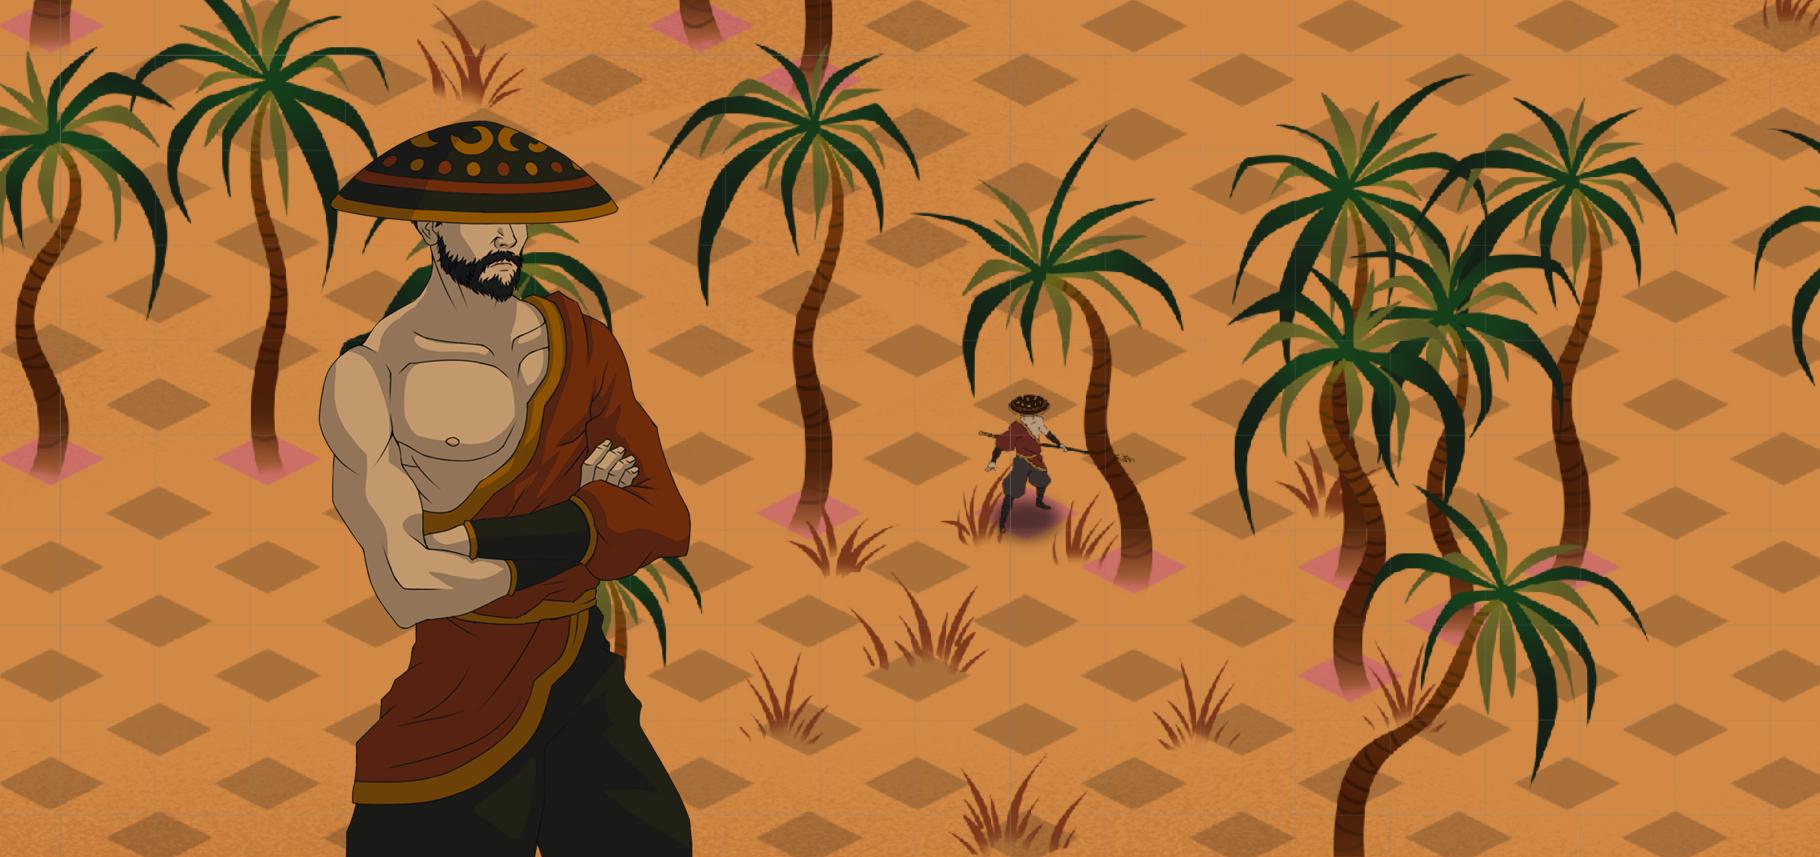 A traveler exploring a strange land.